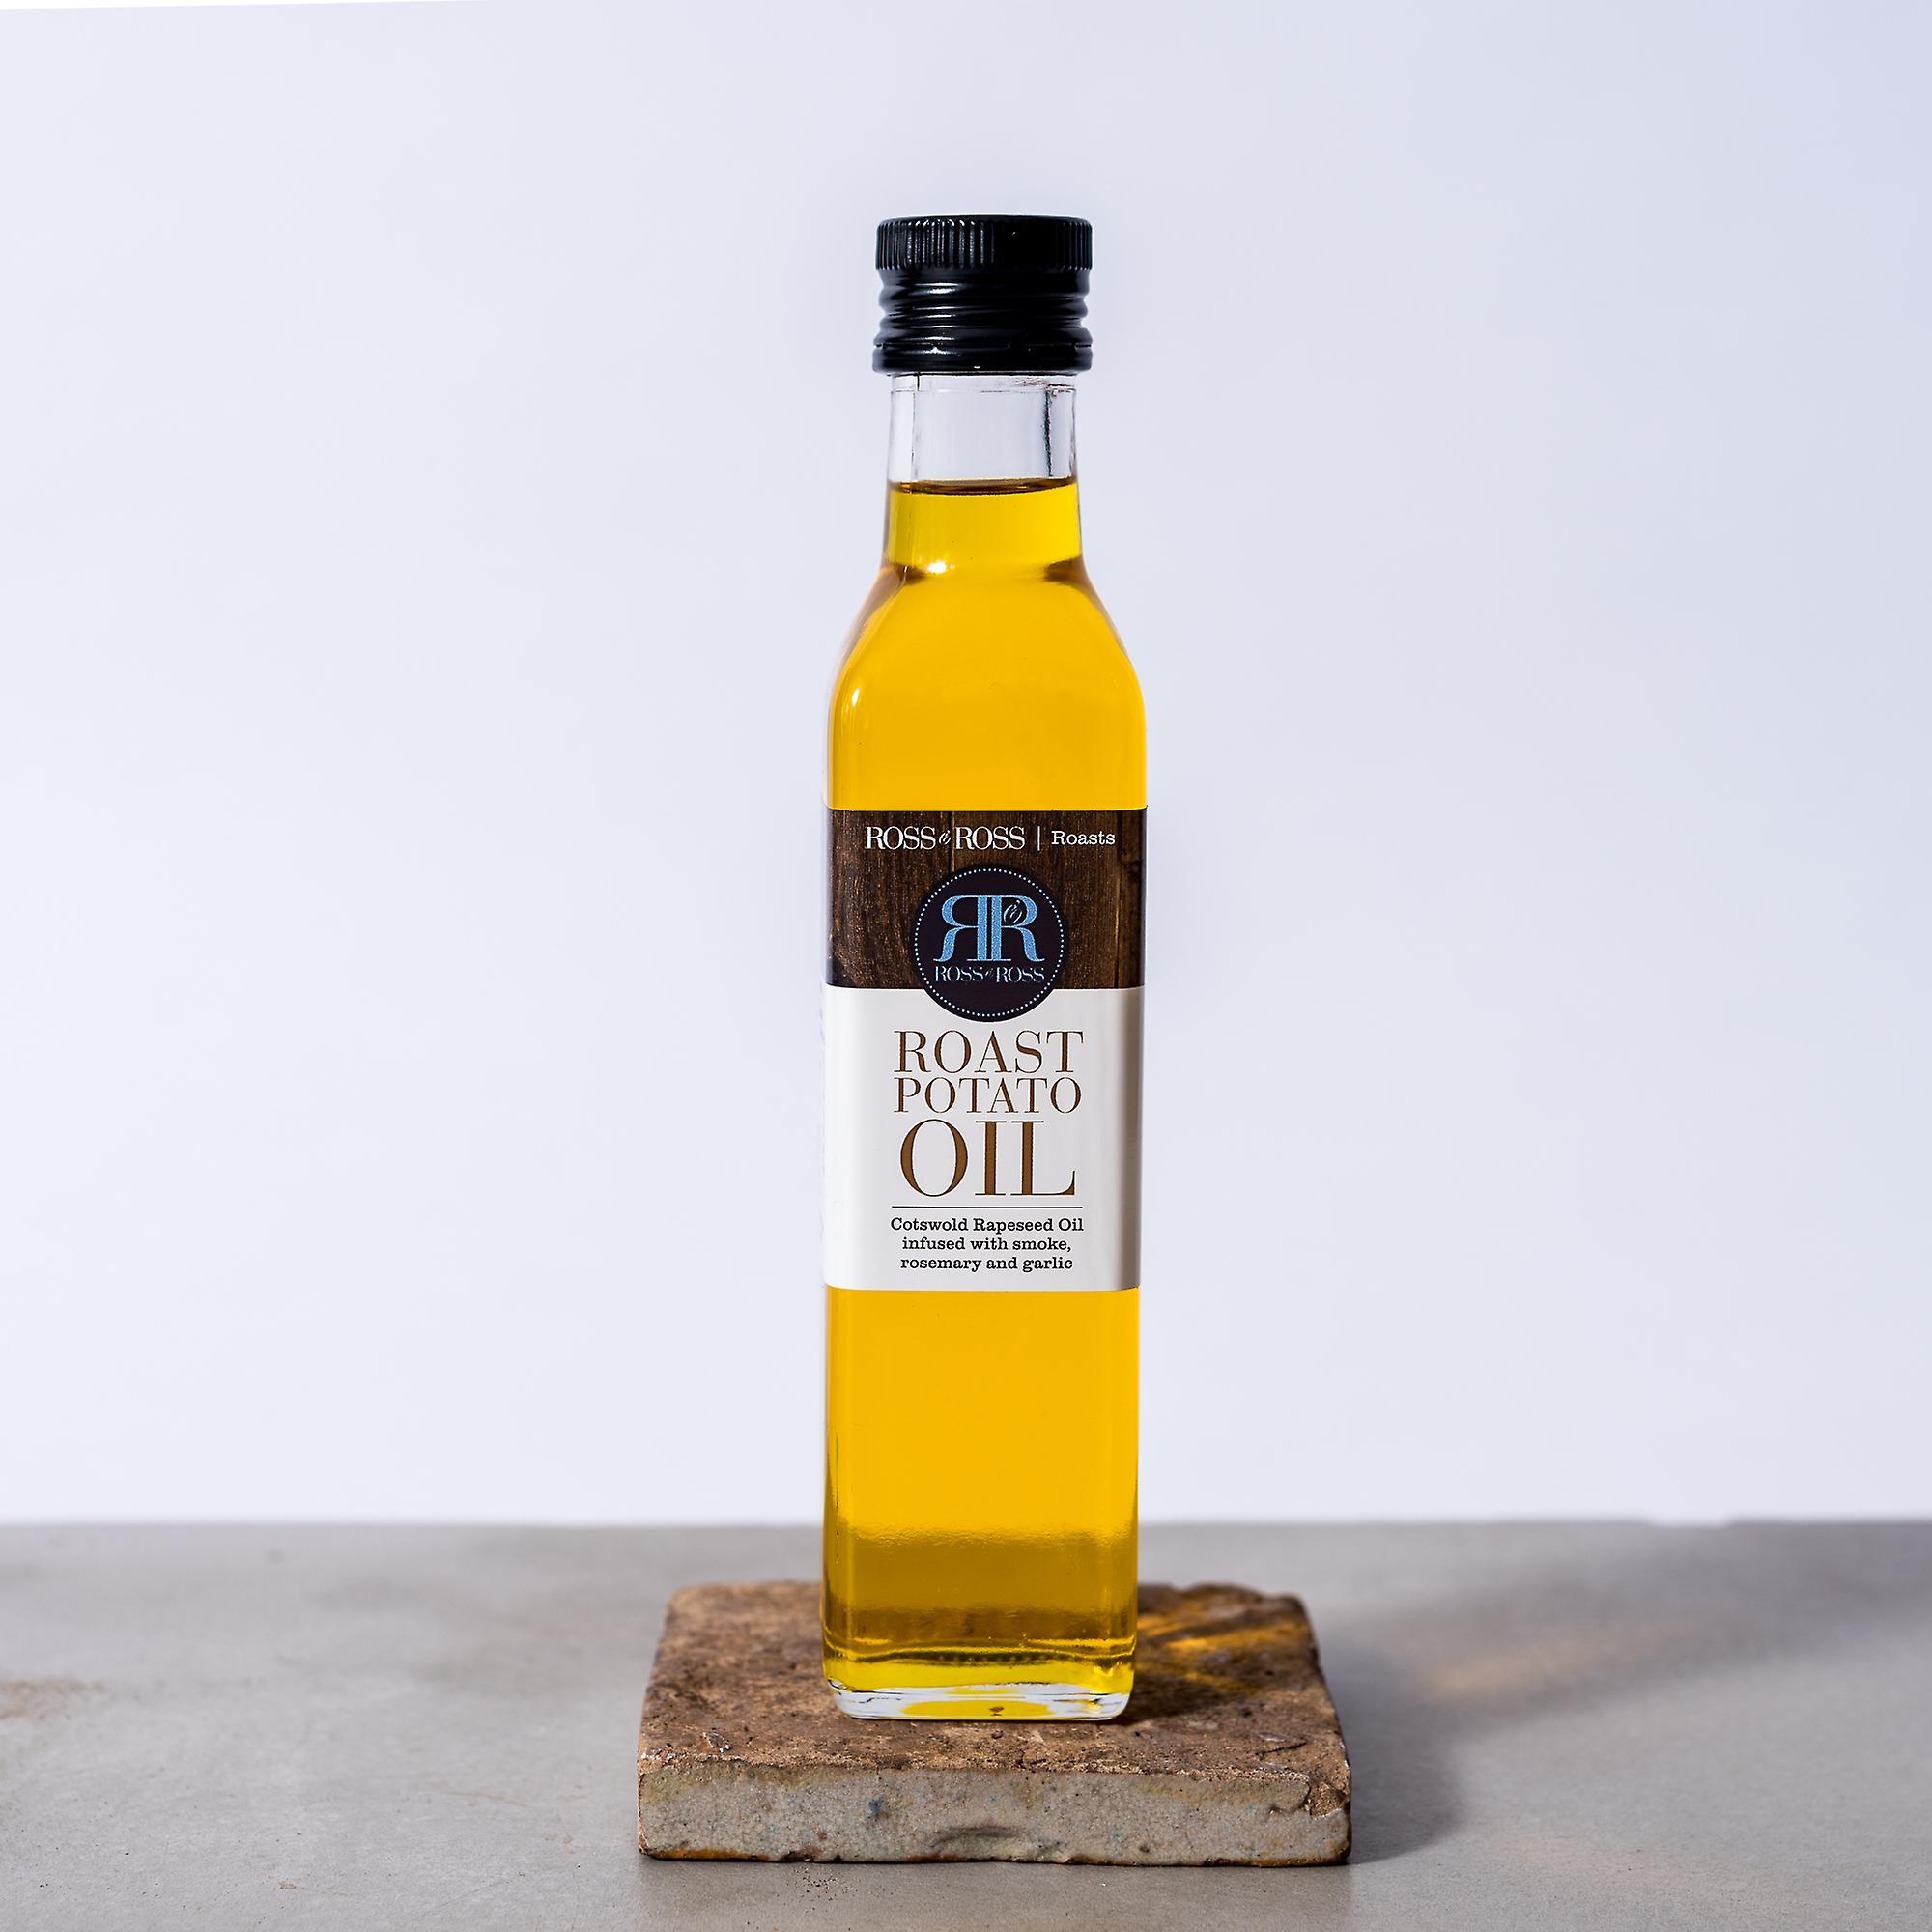 Roast Potato Oil